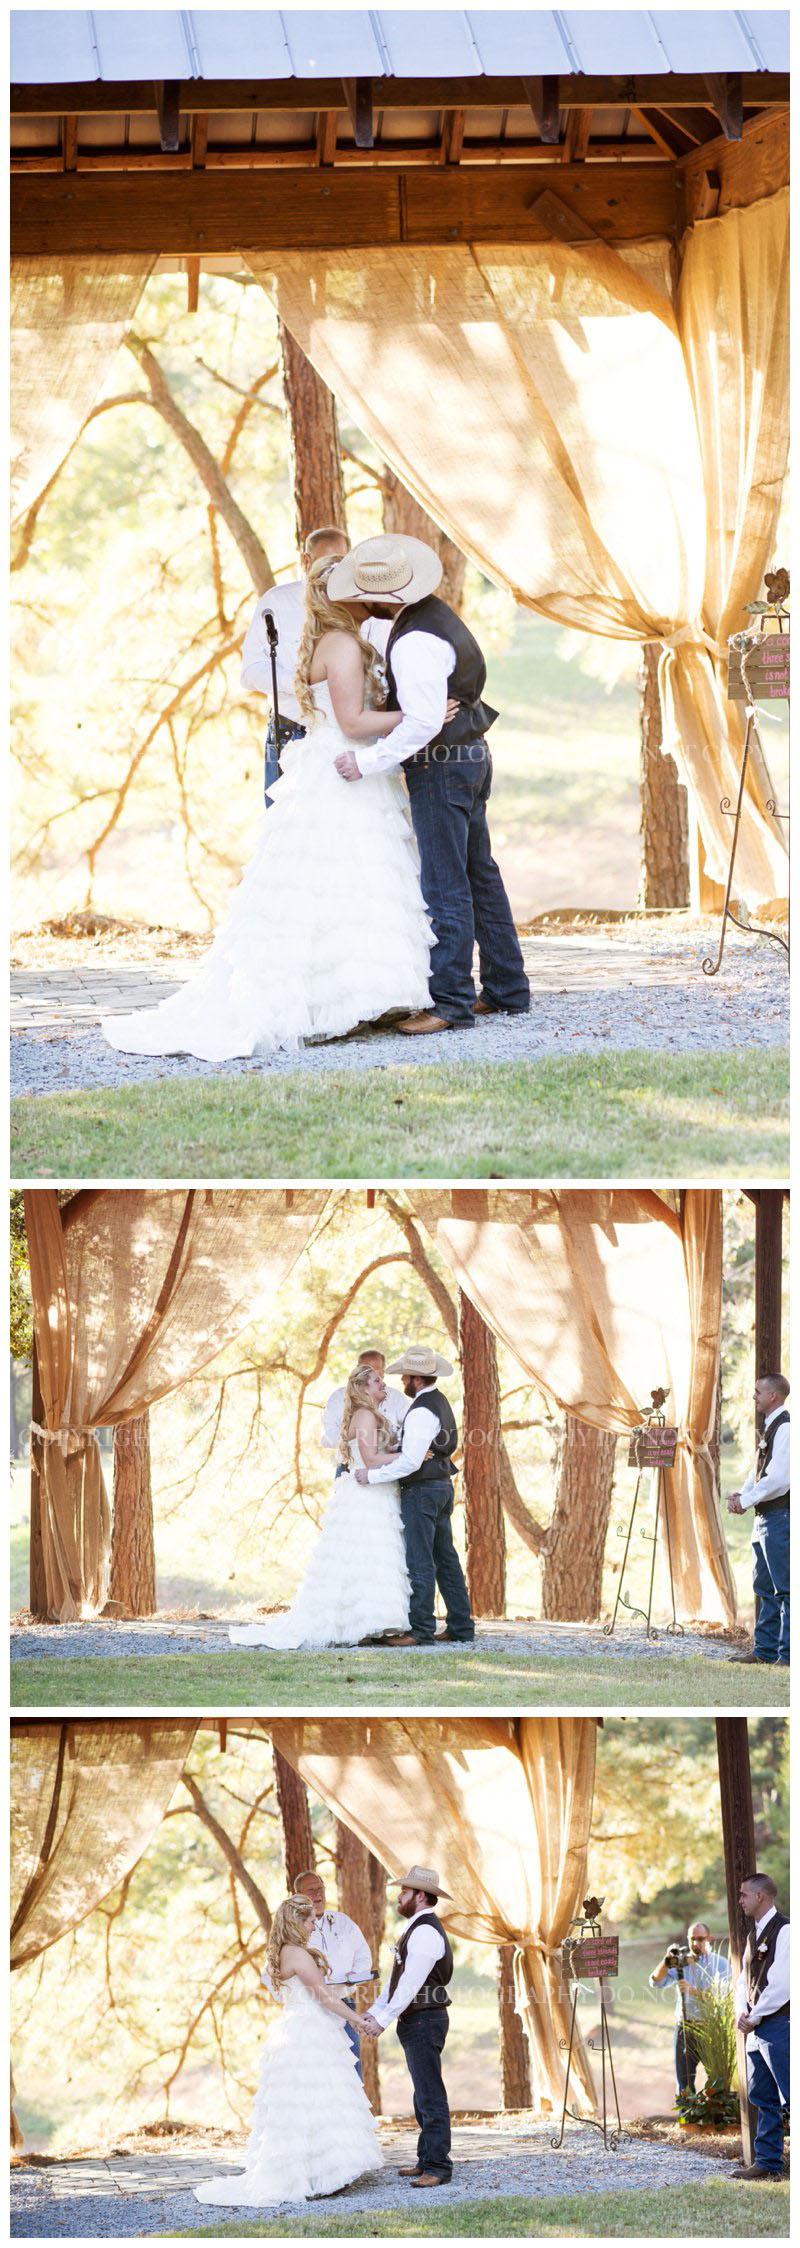 Country_wedding_Asheboro_NC_0553